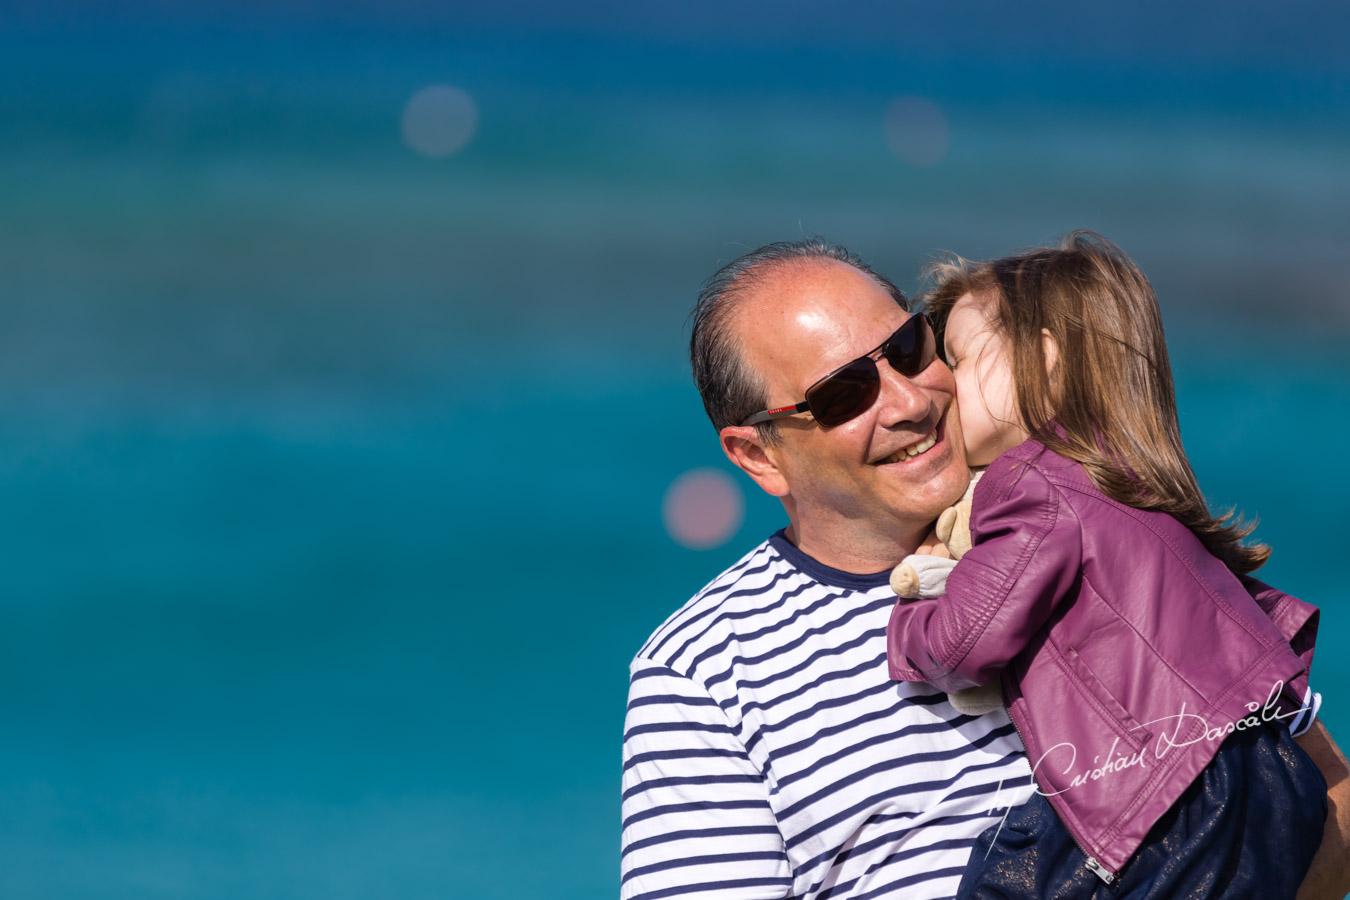 A Family Photo Shoot in Protaras, Cyprus - 05